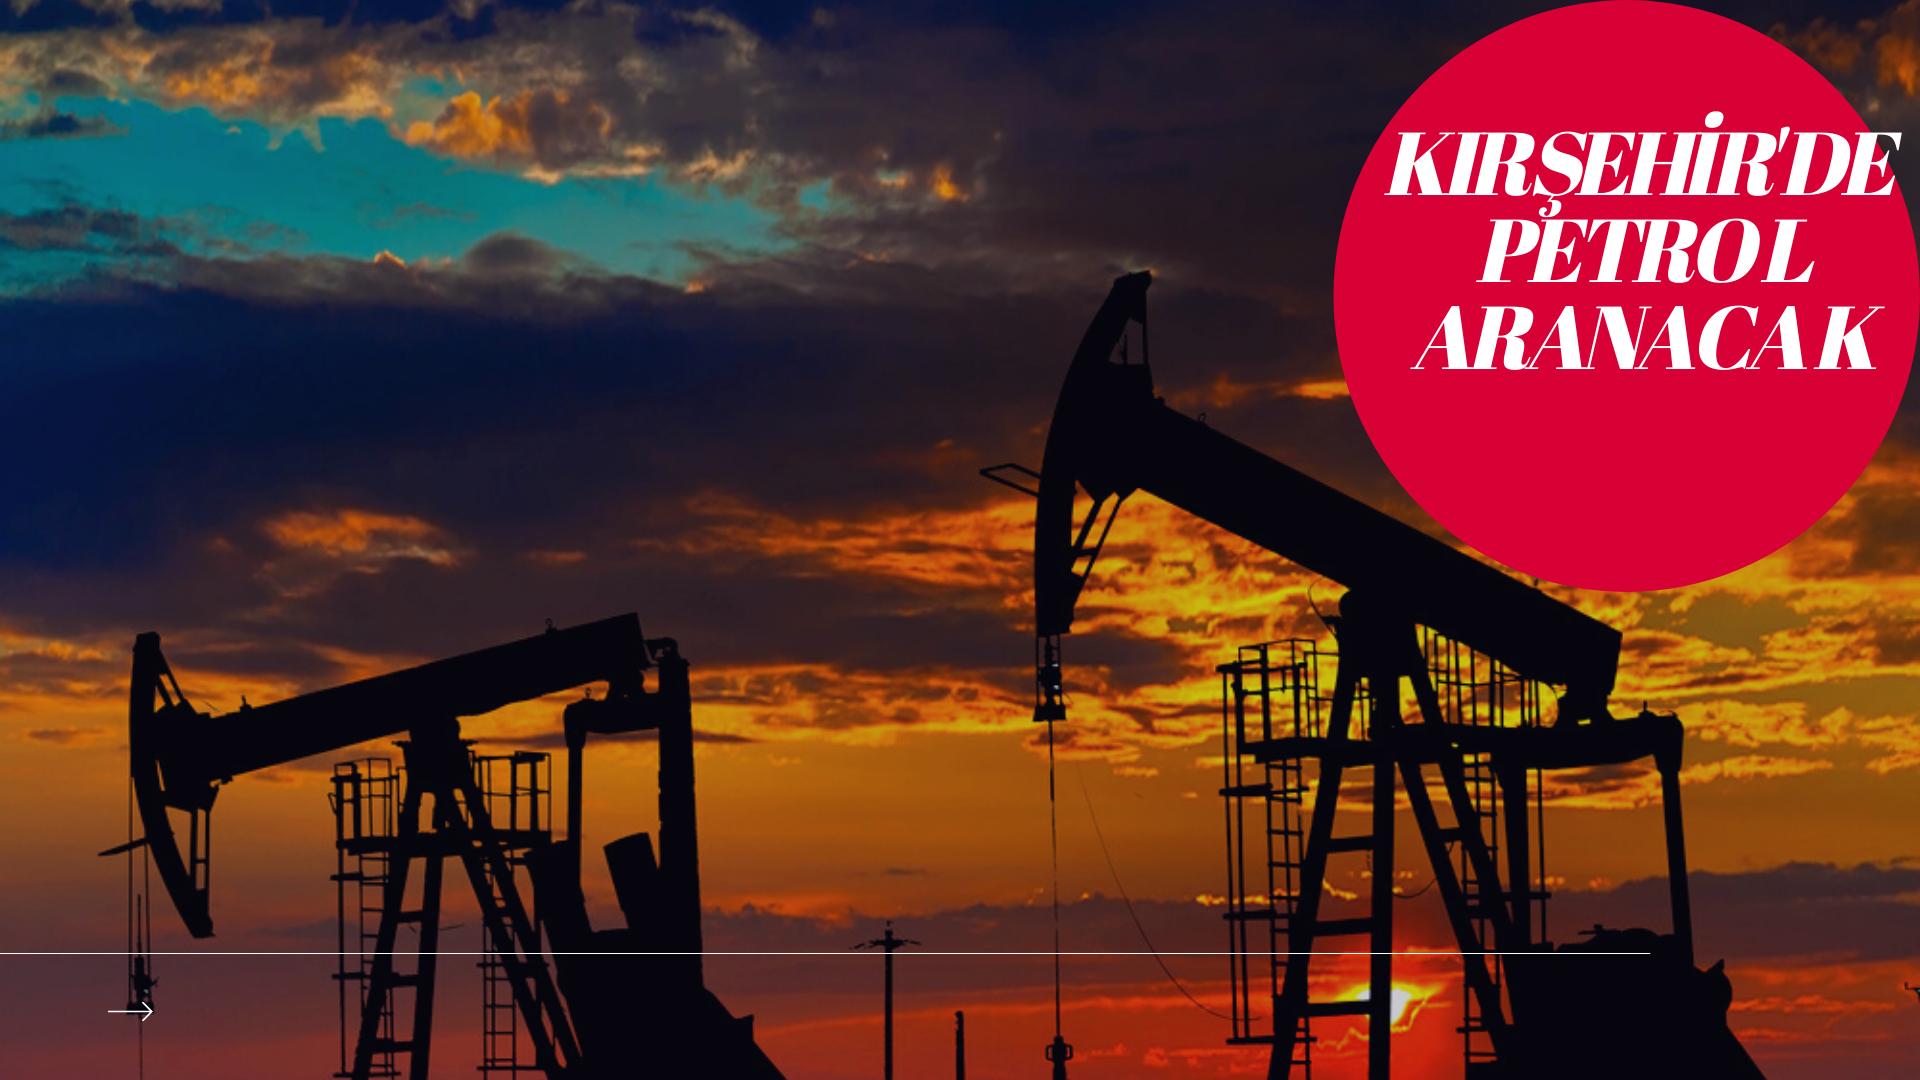 Kırşehir'de petrol aranacak